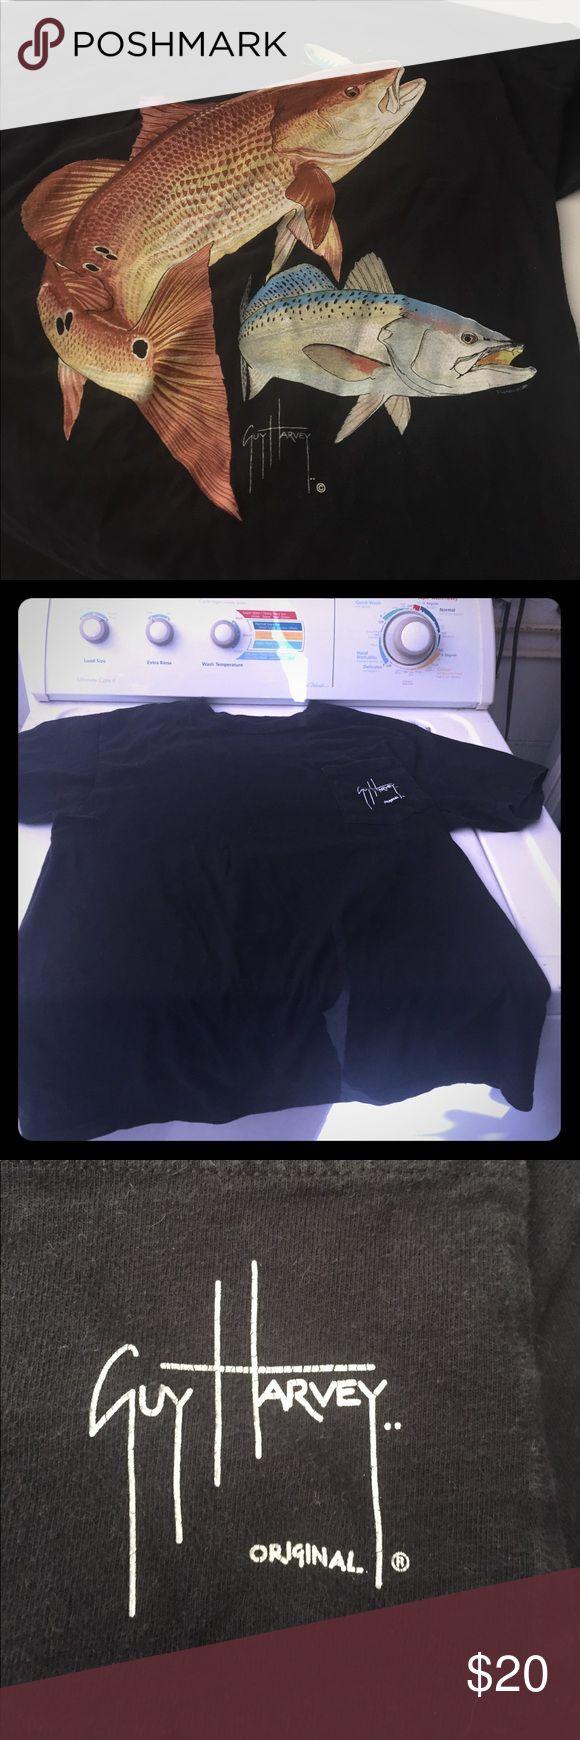 Great guy Harvey shirt!! Super sexy on and looks good Guy Harvey Shirts Tees - Short Sleeve